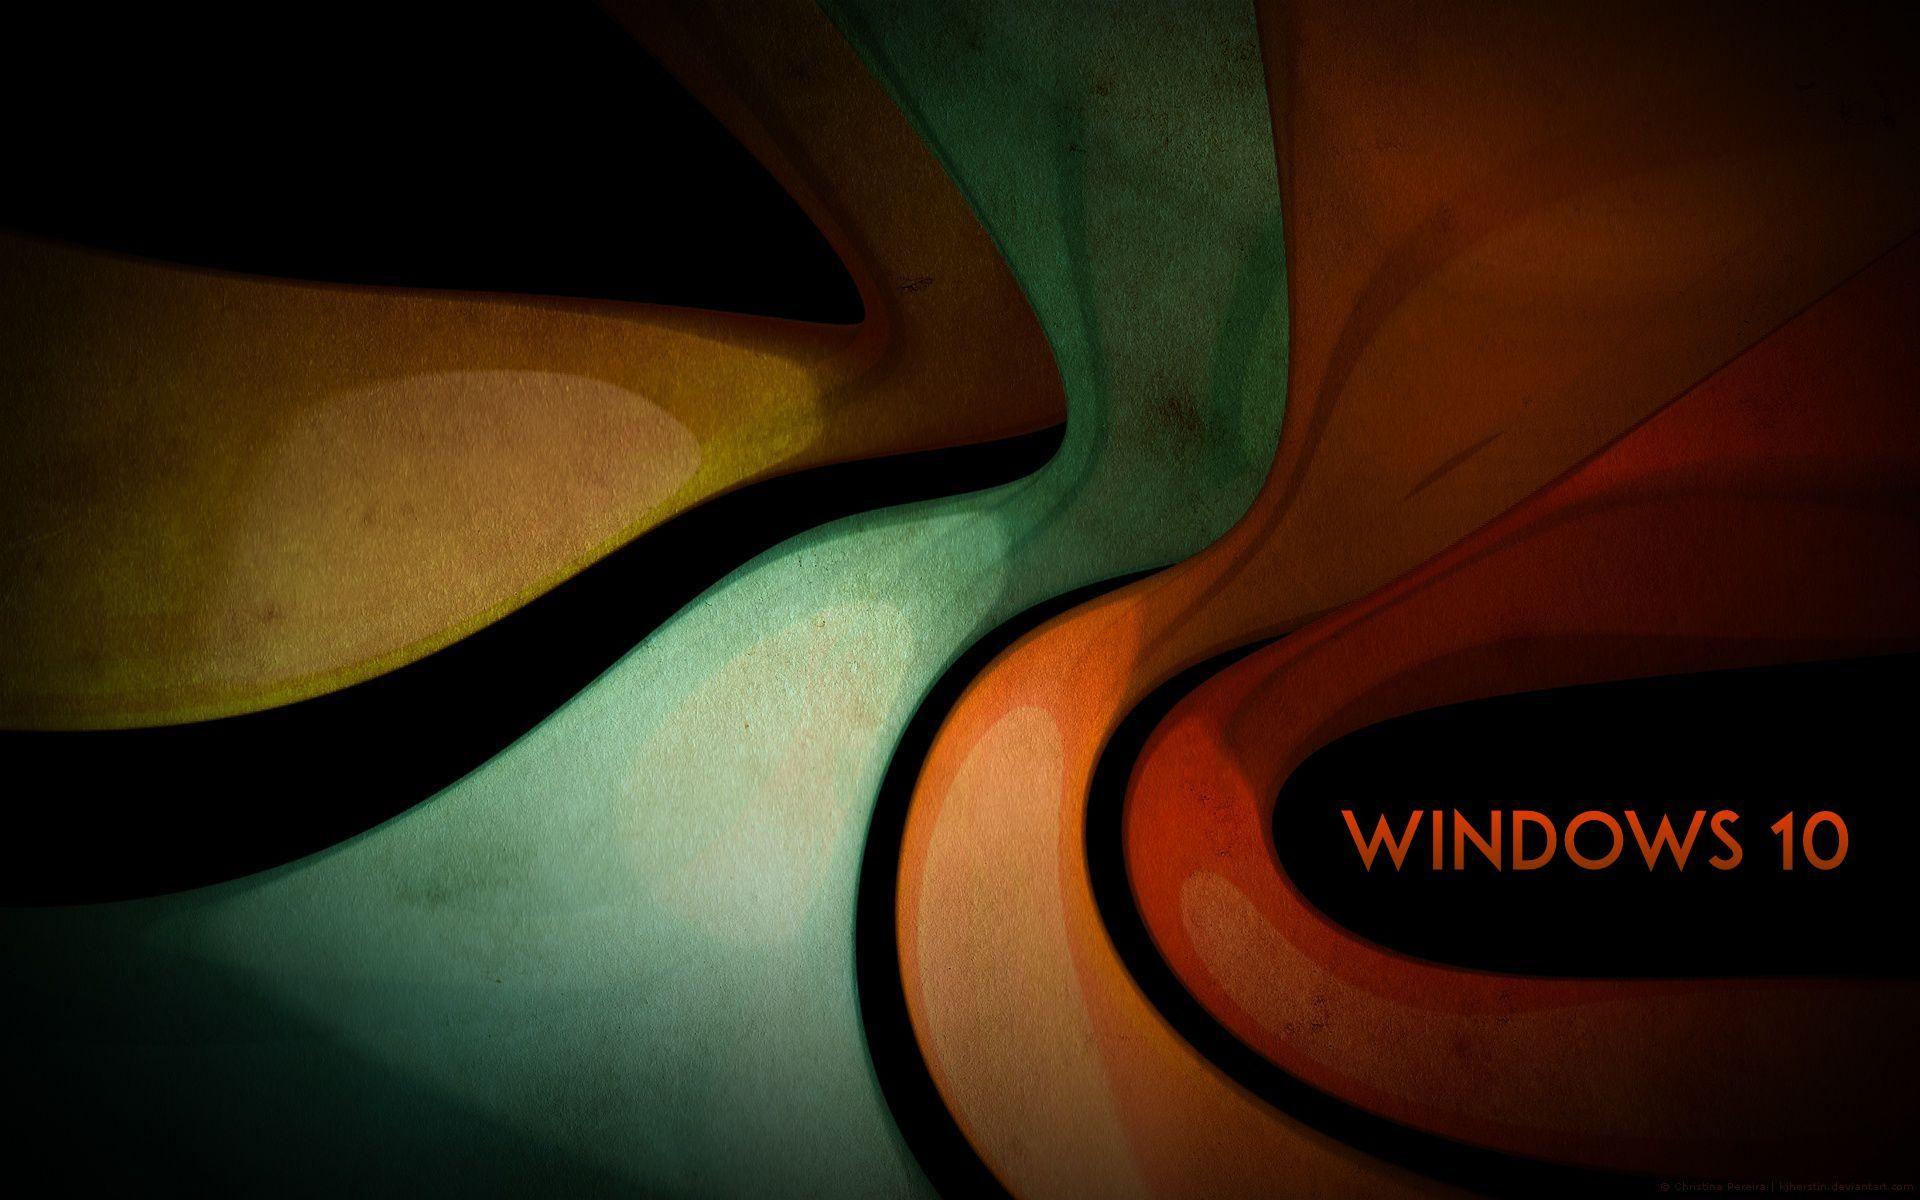 23 Of The Best Windows 10 Wallpaper Backgrounds   Data-src - Window 10 Wallpaper Full Hd - HD Wallpaper